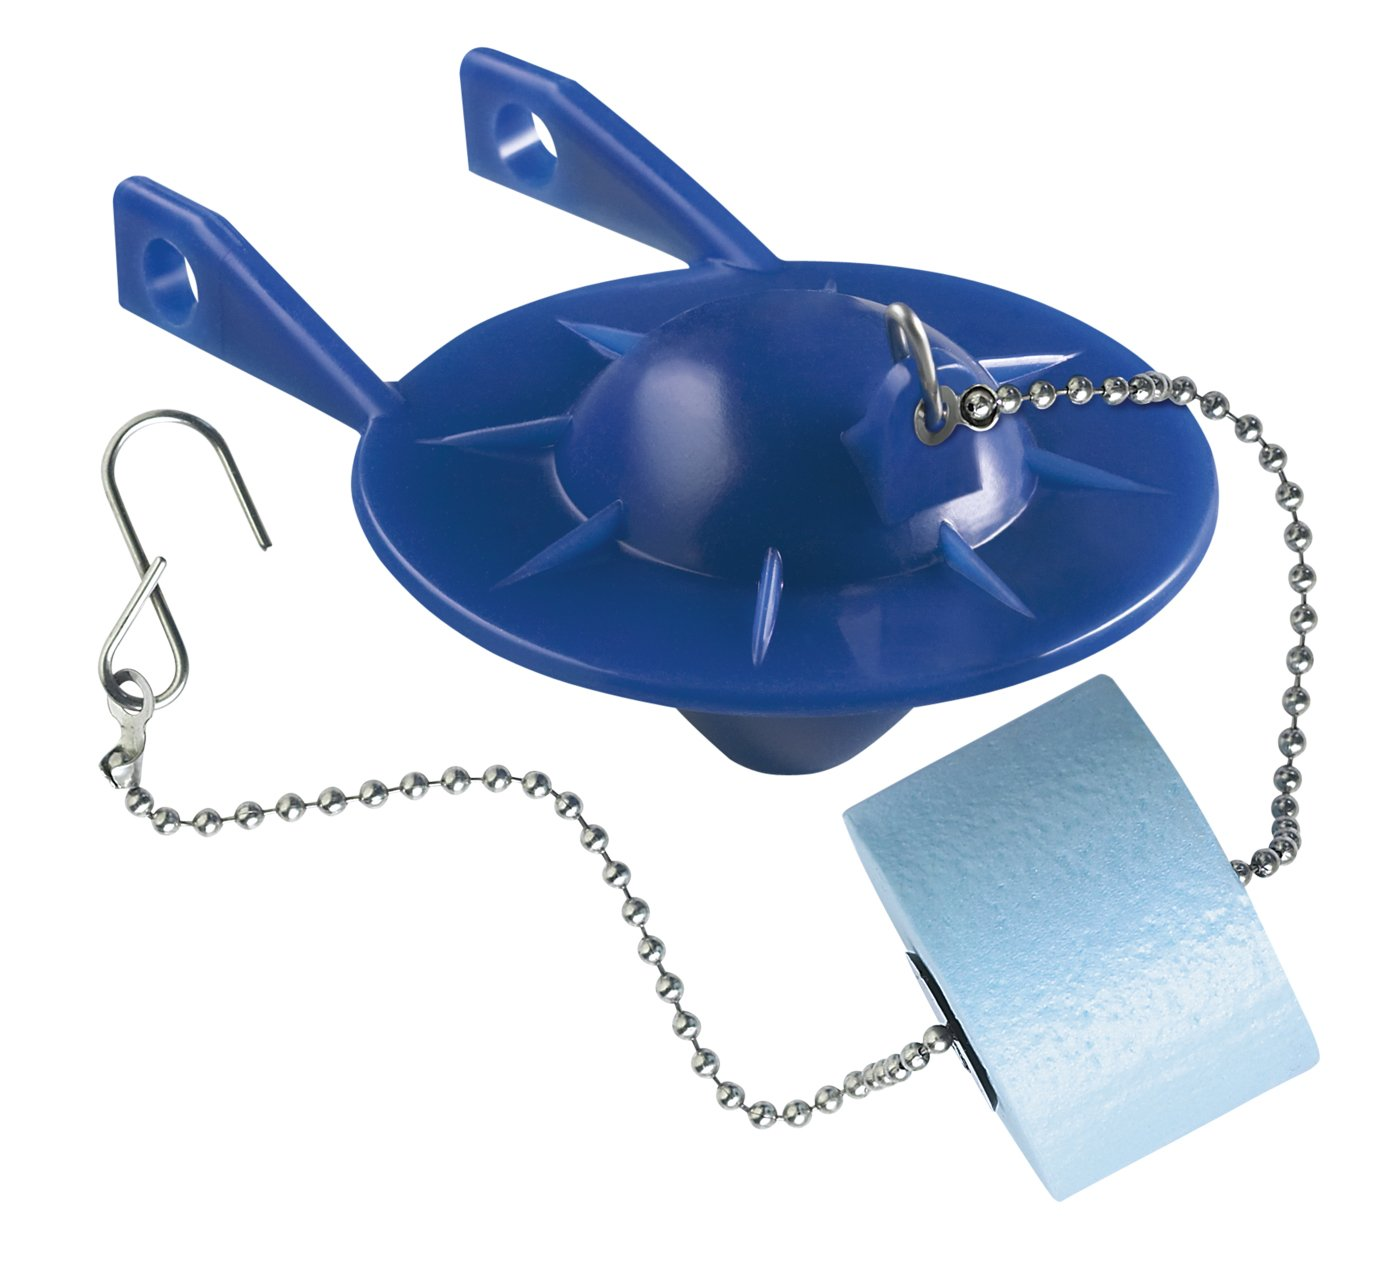 Kohler Part GP85160 (Blue Flapper with Float), 2 In. In,